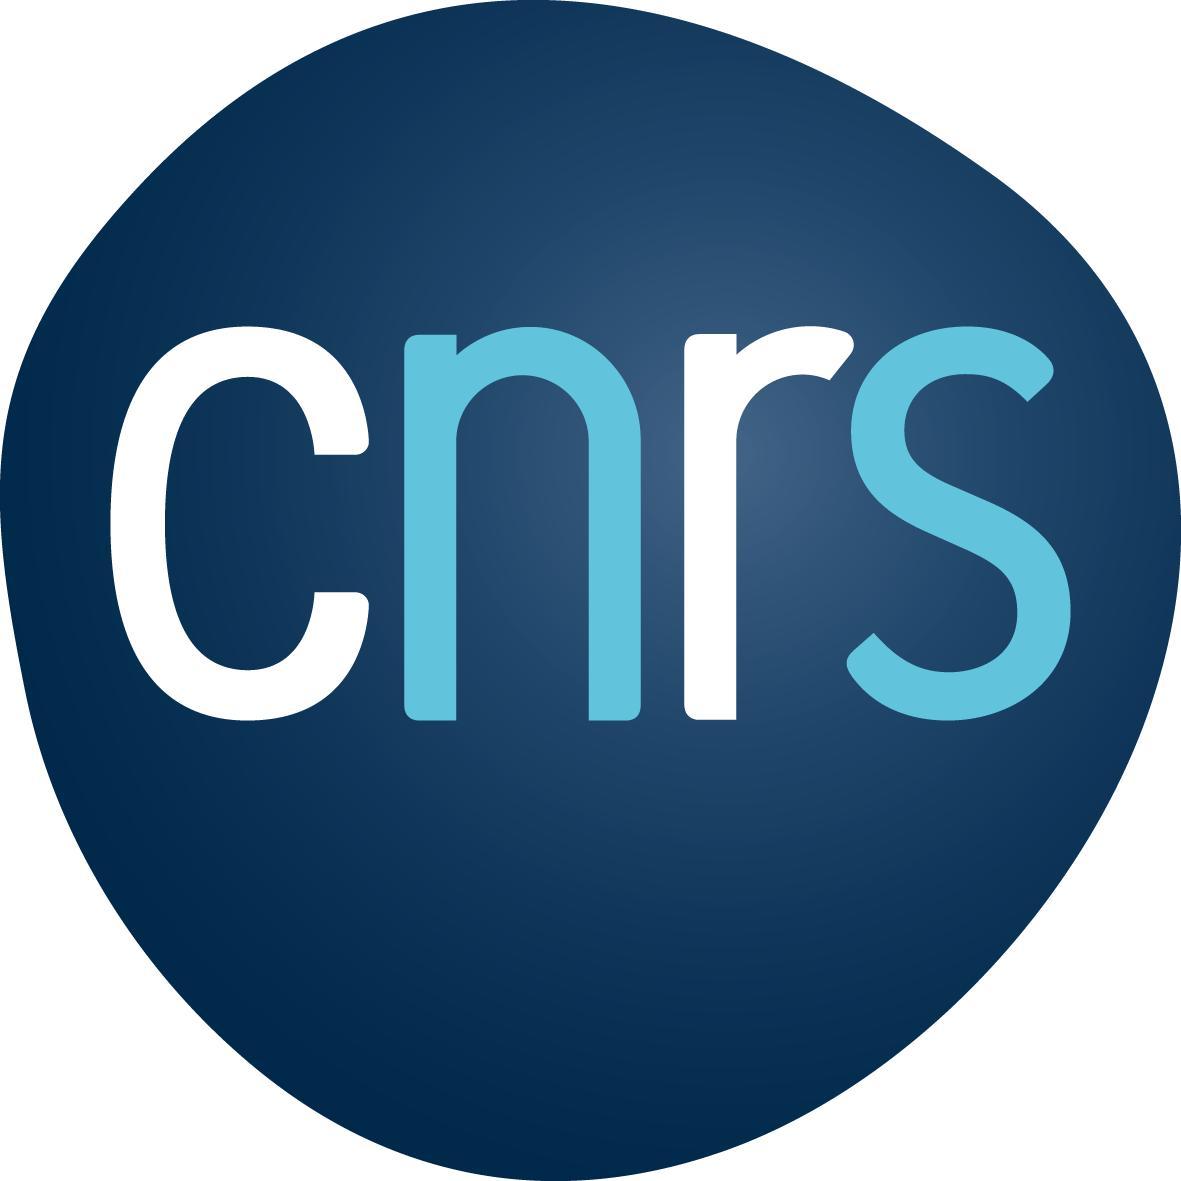 Cnrs Logo Cnrs 2019